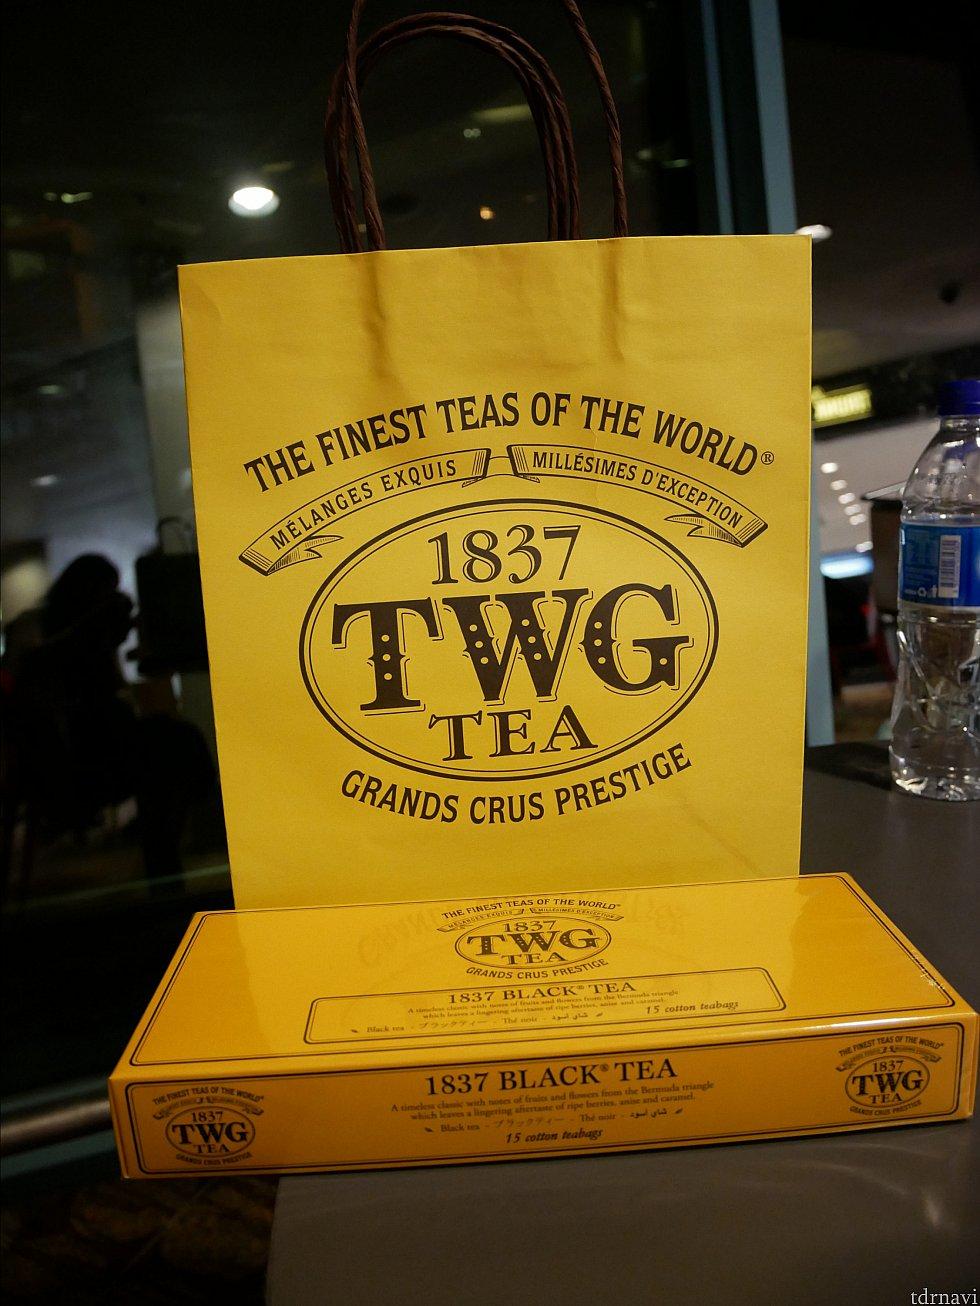 TWGの紅茶もお土産に!TWGは深夜1時までやってました!さすがシンガポールを代表するテイーメーカー!各ターミナルに1か所はあるようです。 手荷物になっちゃいますが、お土産を買い忘れても、空港内で色々買えます!